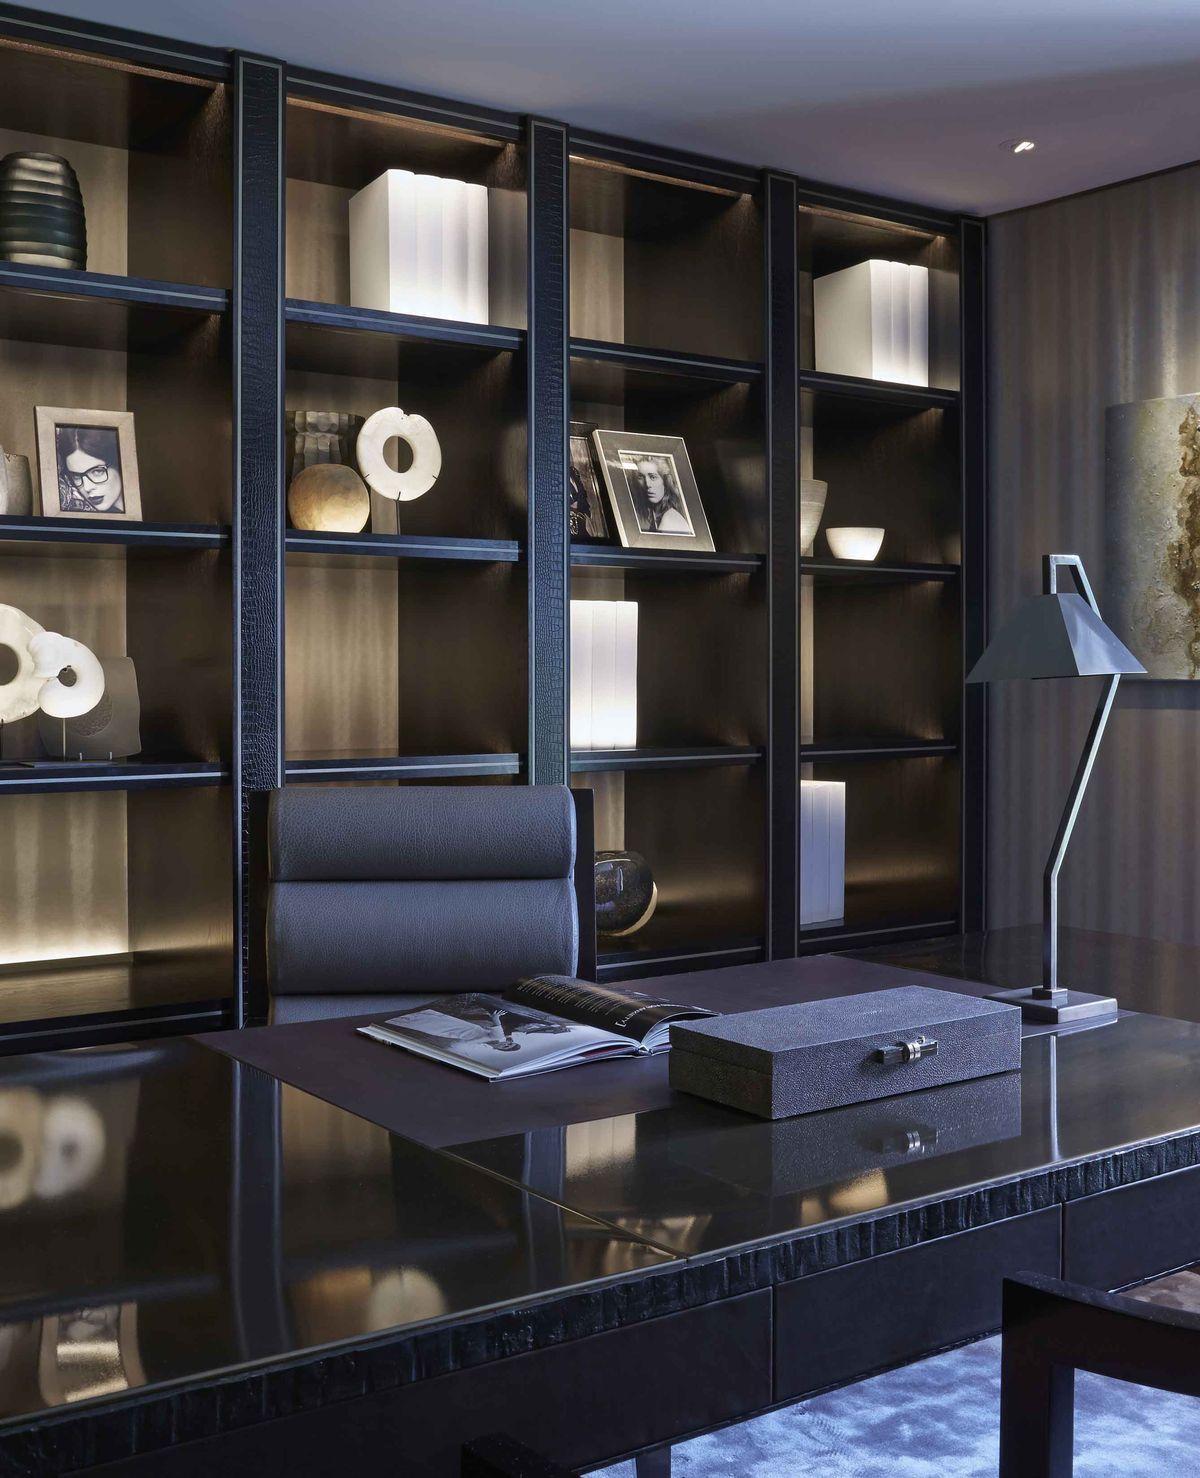 Interior Designmodern Home Office: Home Decor, So Modern And Amazing, Dark Design